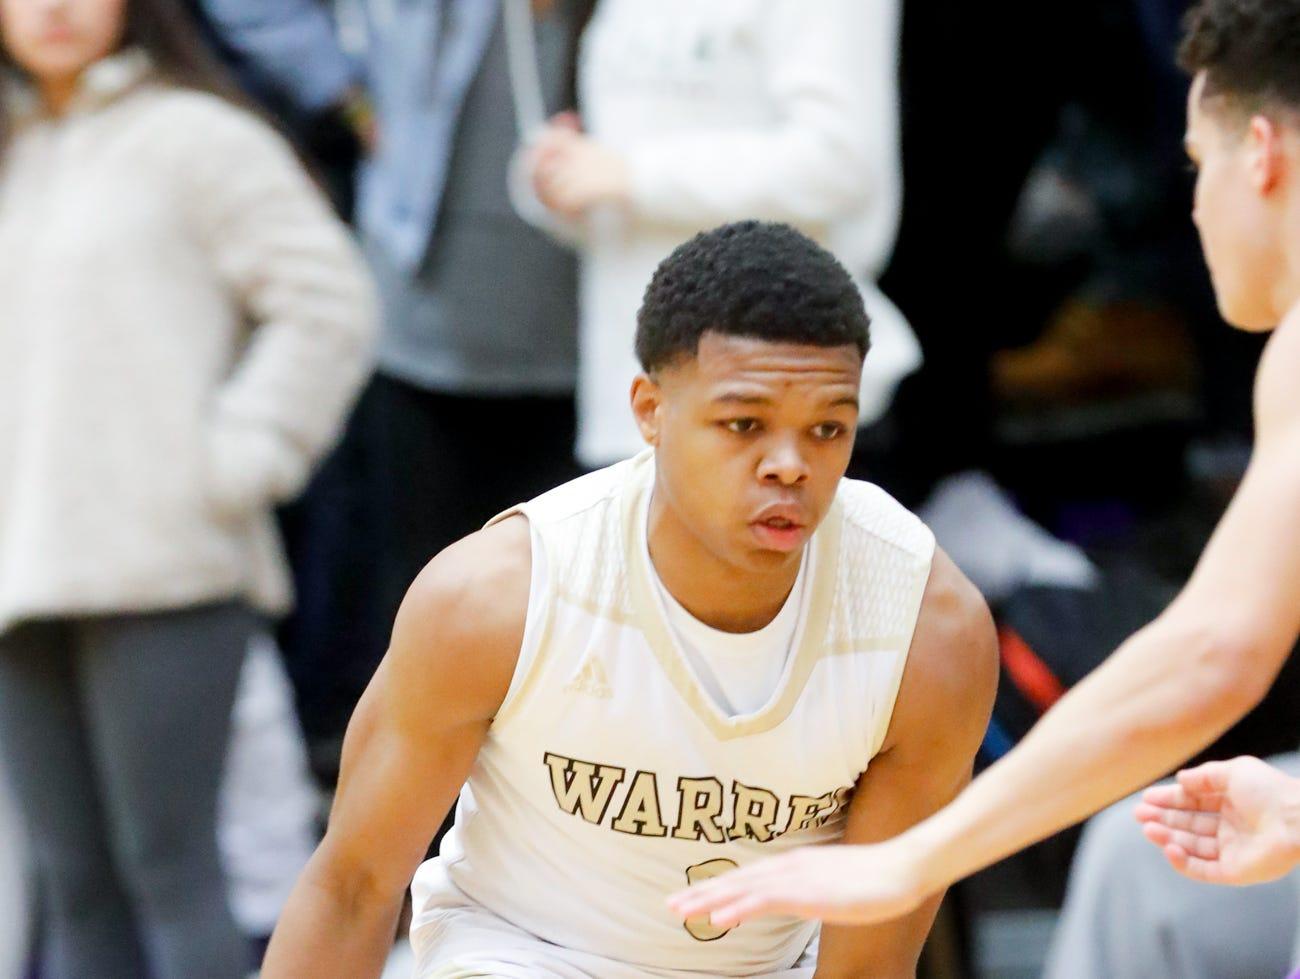 Warren Central High School's Manuel Brown (3) dribbles between his legs during a varsity boys basketball game between Cathedral High School and Warren Central High School at Warren Central on Friday, Dec. 7, 2018.